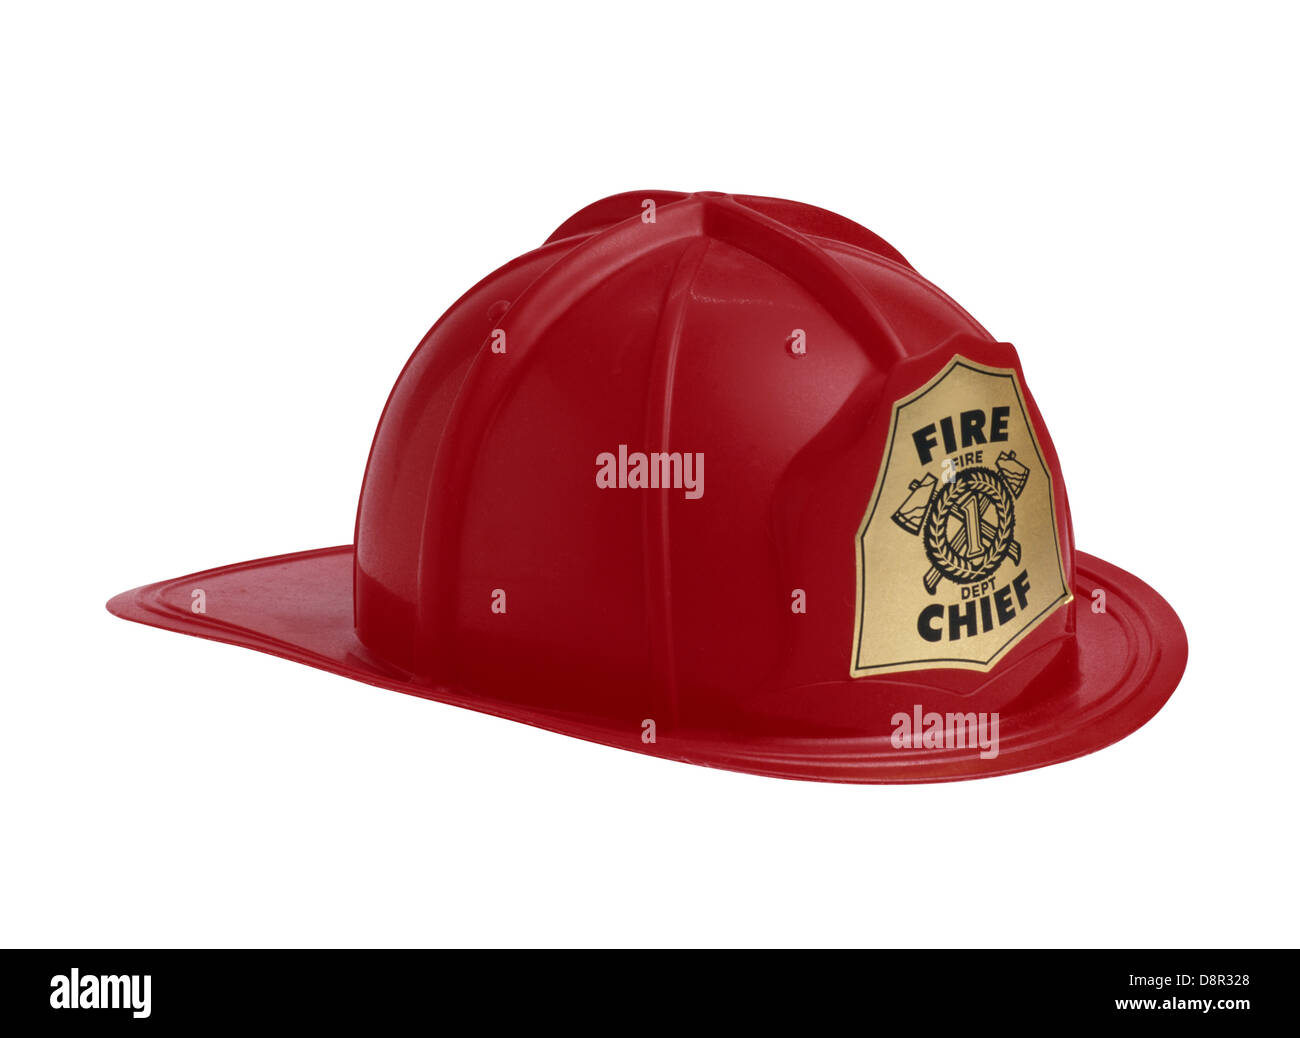 firefighter helmet toy plastic helmet stock photos firefighter